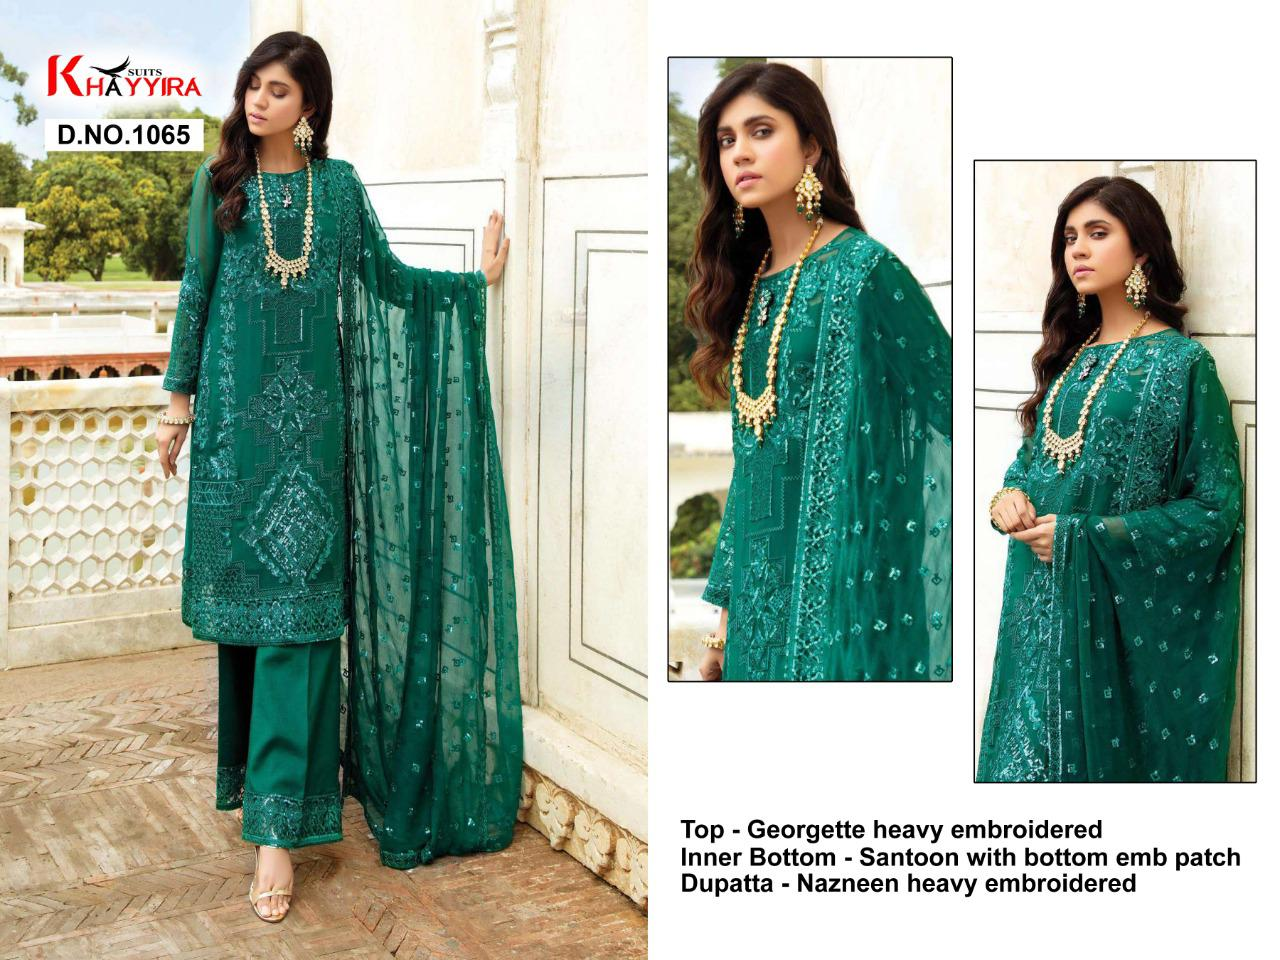 Khayyira Eleonora Collection Salwar Suit Wholesale Catalog 5 Pcs 4 - Khayyira Eleonora Collection Salwar Suit Wholesale Catalog 5 Pcs